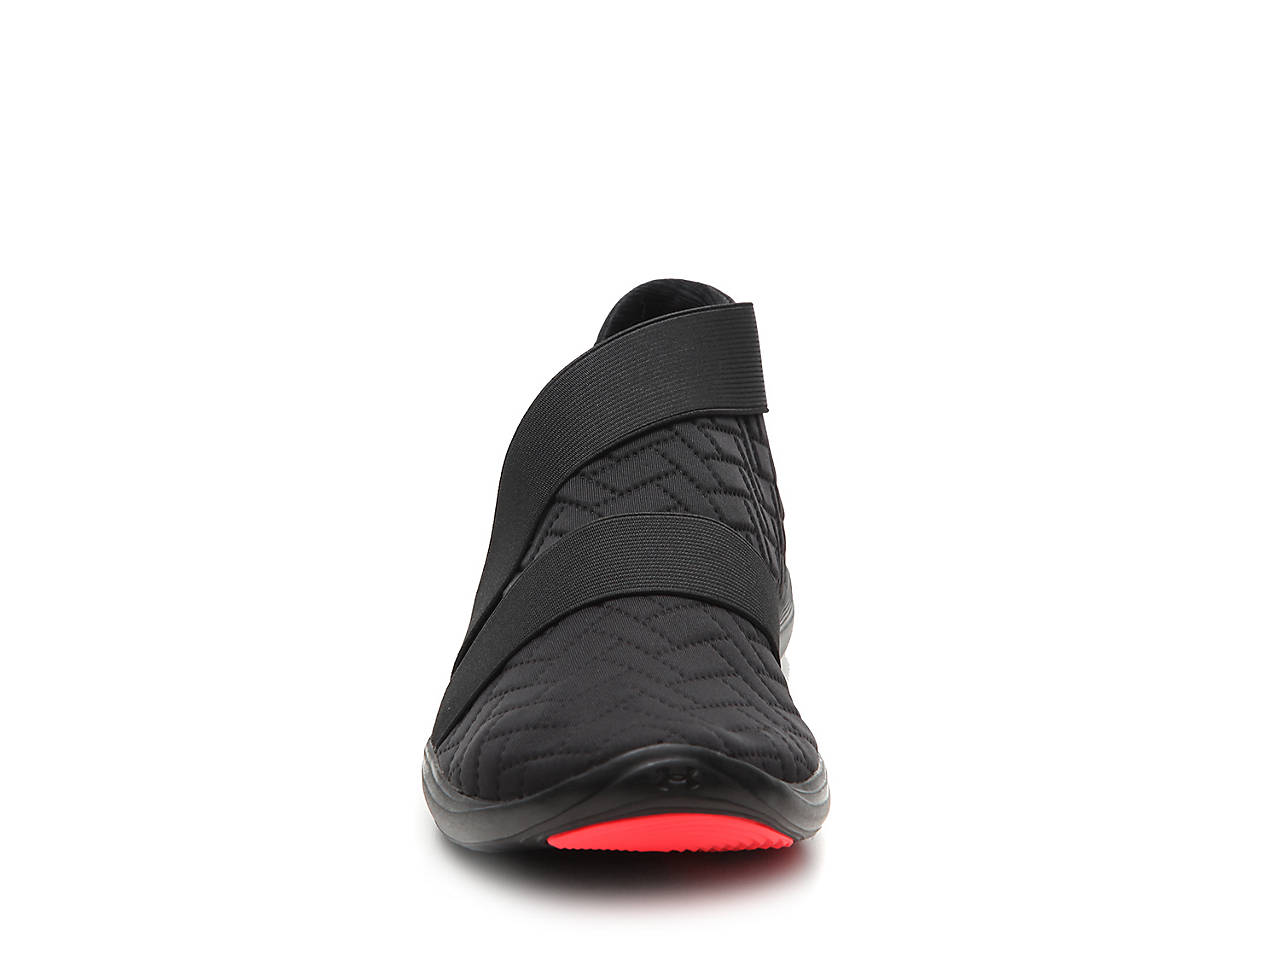 bcfe194df3ea8 Under Armour Precision Slip-On Training Shoe - Women s Women s Shoes ...